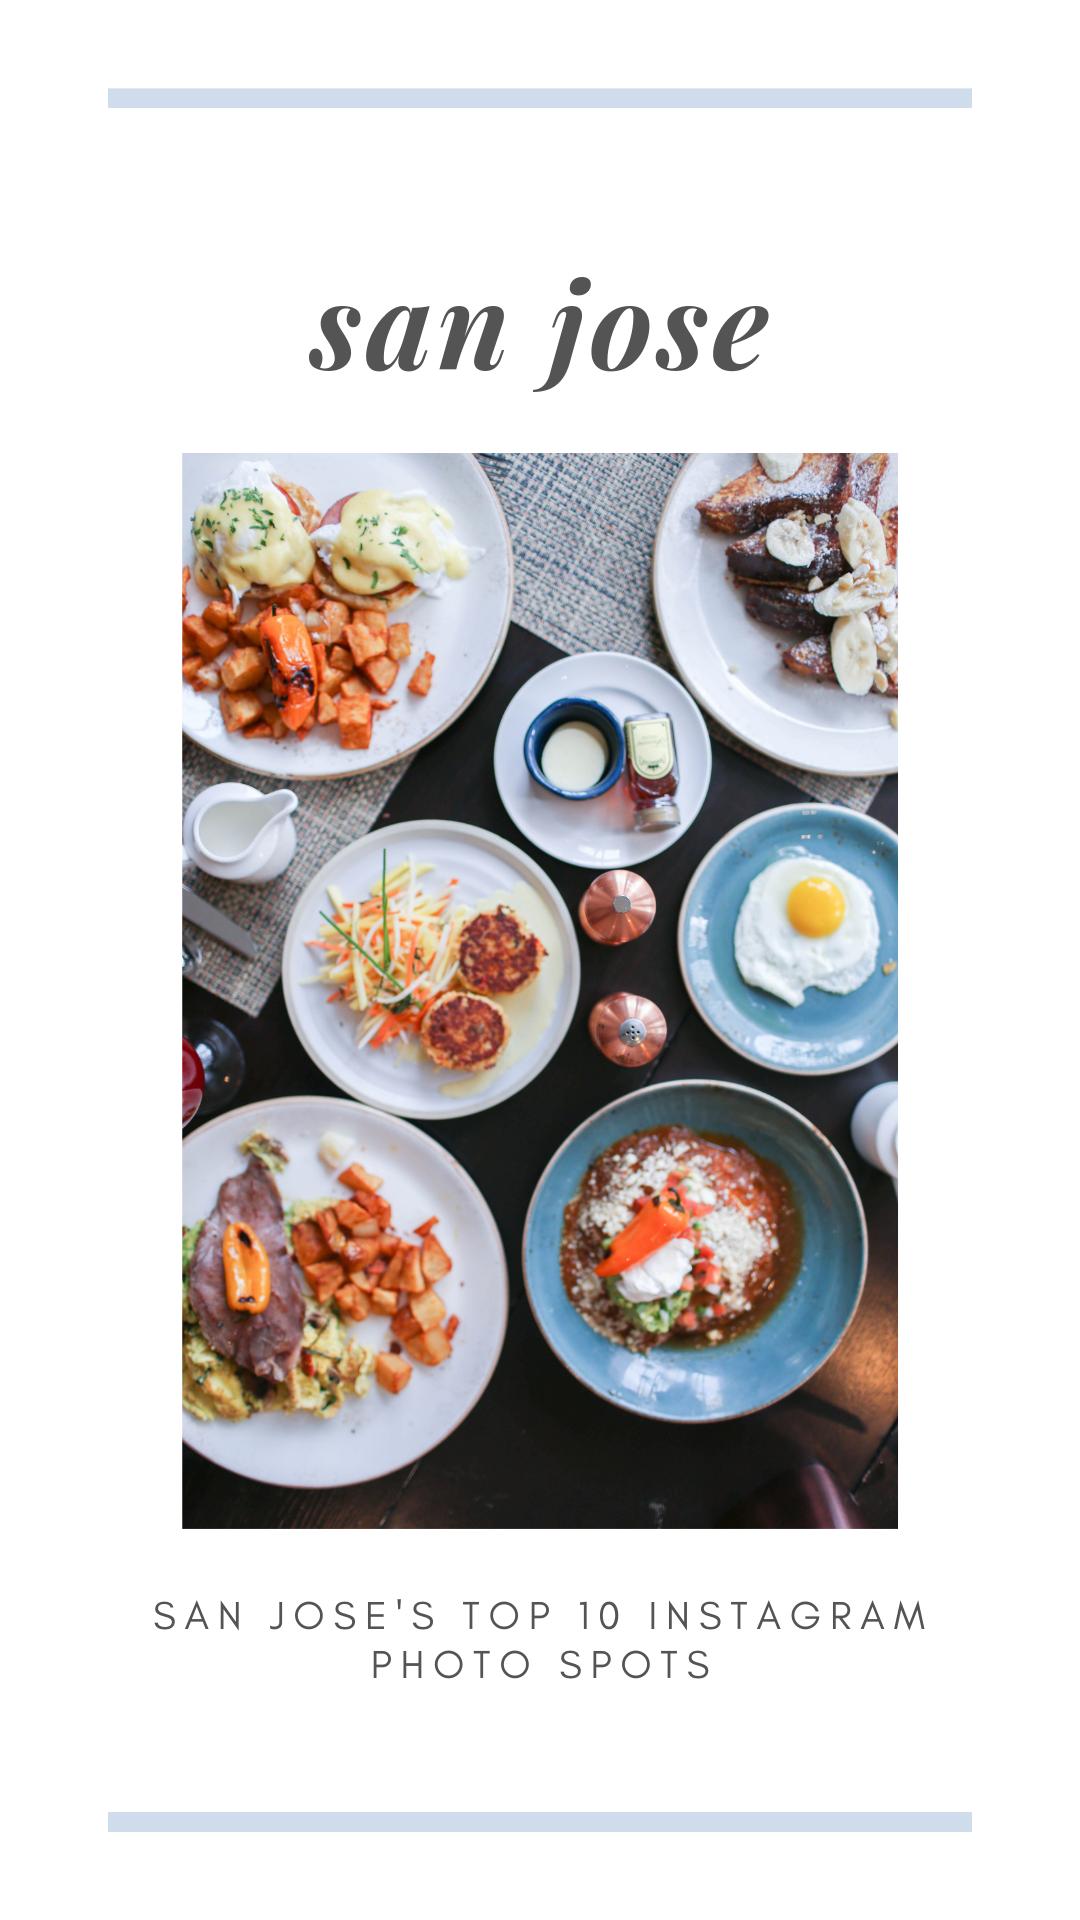 Top 10 Instagram Photo Spots in San Jose